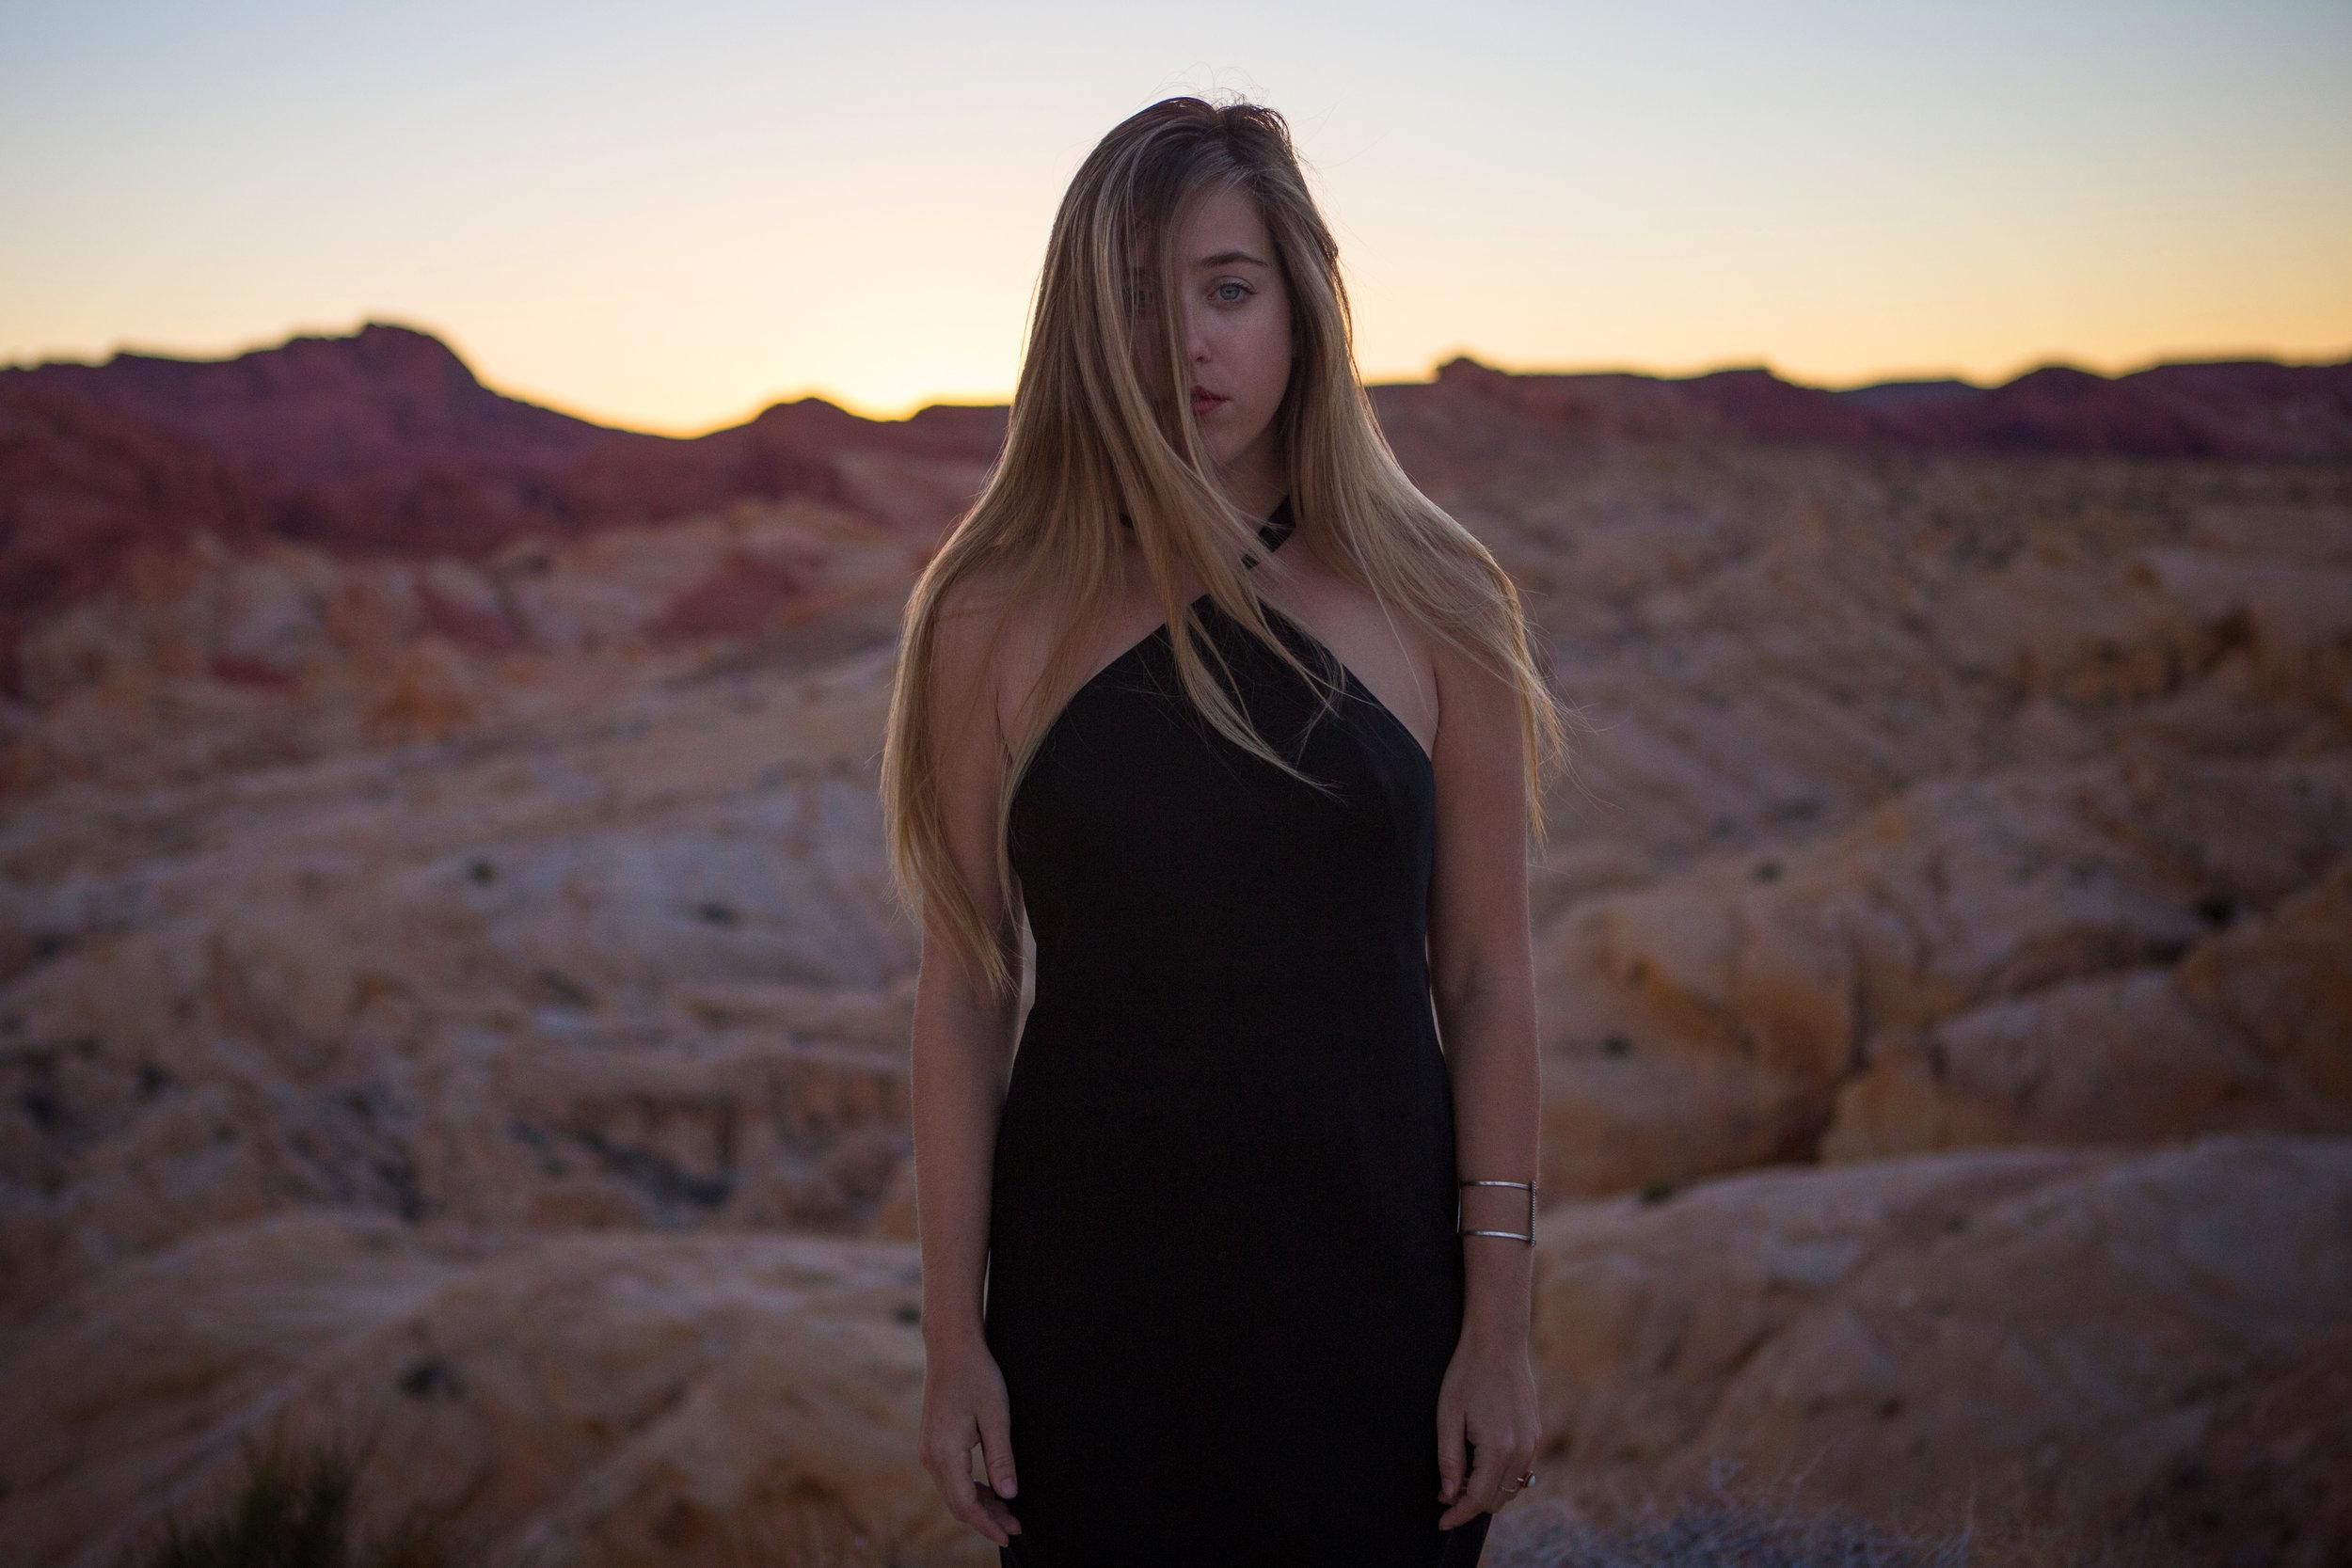 AstroBandit_JordanRose_ValleyofFire_GoldenHour_Fashion_LeonMax_9.jpg